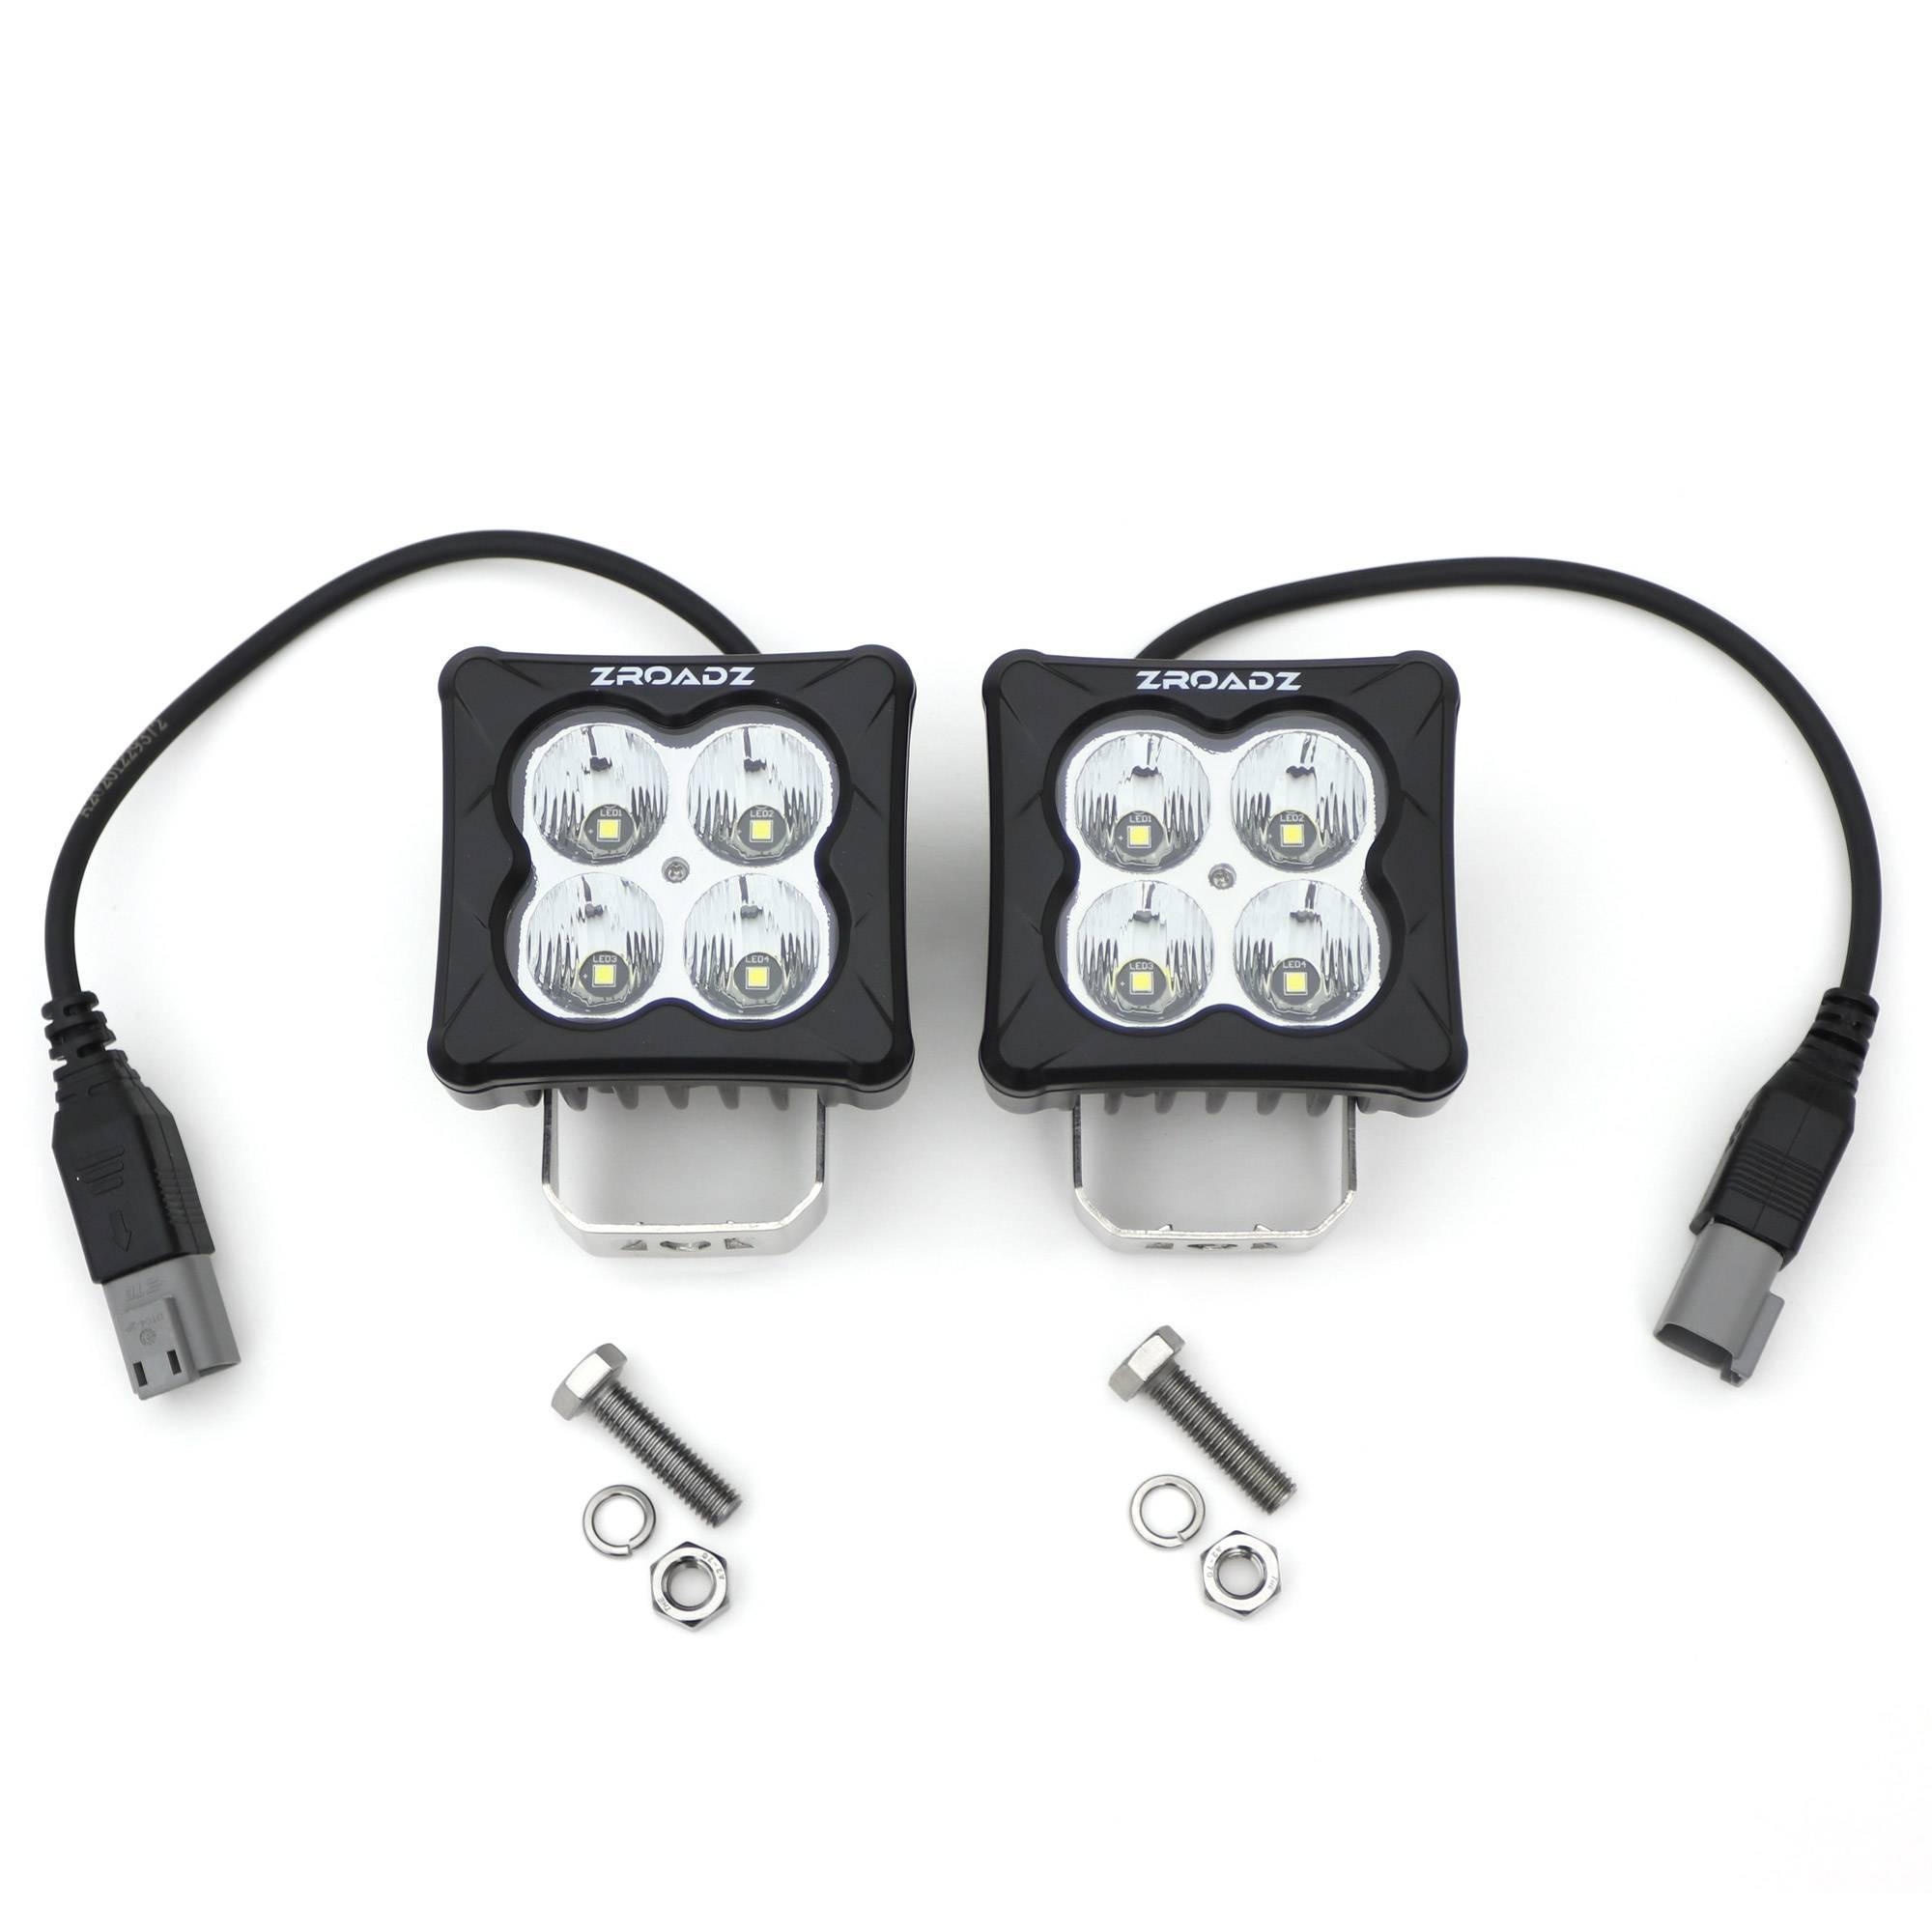 ZROADZ OFF ROAD PRODUCTS - 3 inch ZROADZ LED Light Pod Set, G2 Series, Bright White, Flood Beam, 2 Piece - PN #Z30BC20W-D3F-2